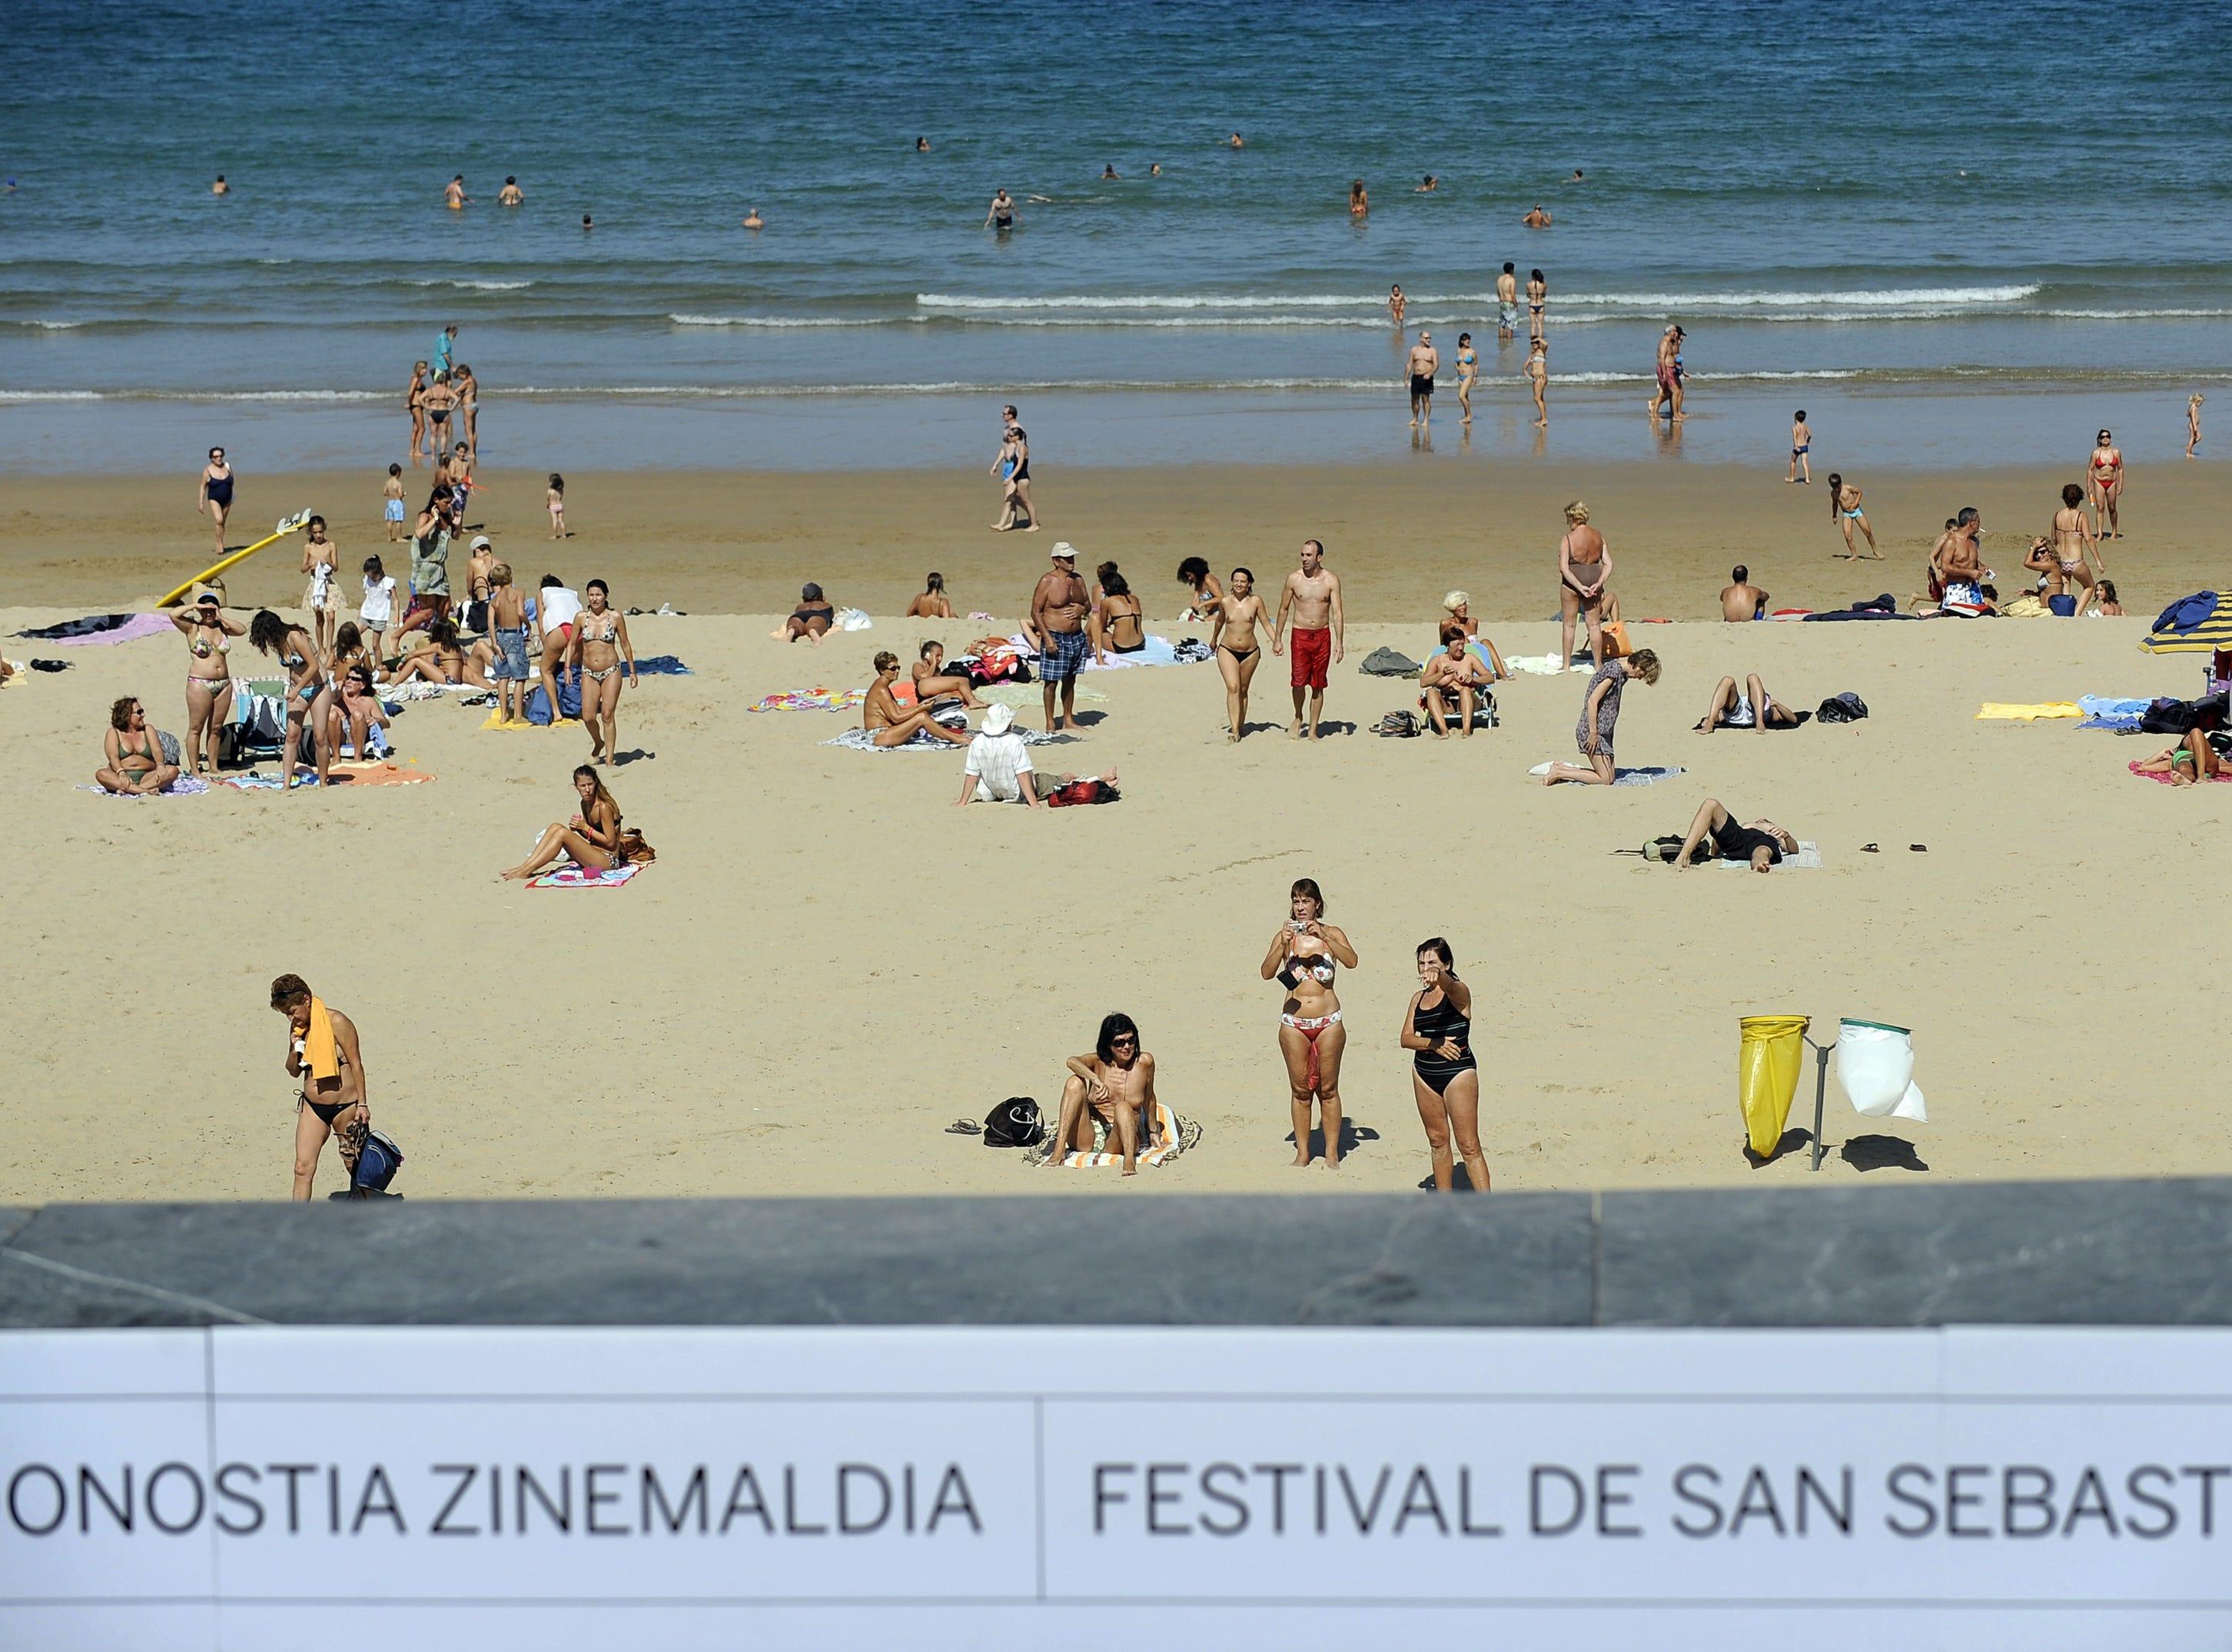 People sunbathe at Zurriola beach, next to Kursaal Palace, where the 60th San Sebastian International Film Festival is taking place, on September 22, 2012, in the northern Spanish Basque city of San Sebastian.  AFP PHOTO/ RAFA RIVAS        (Photo credit should read RAFA RIVAS/AFP/GettyImages)